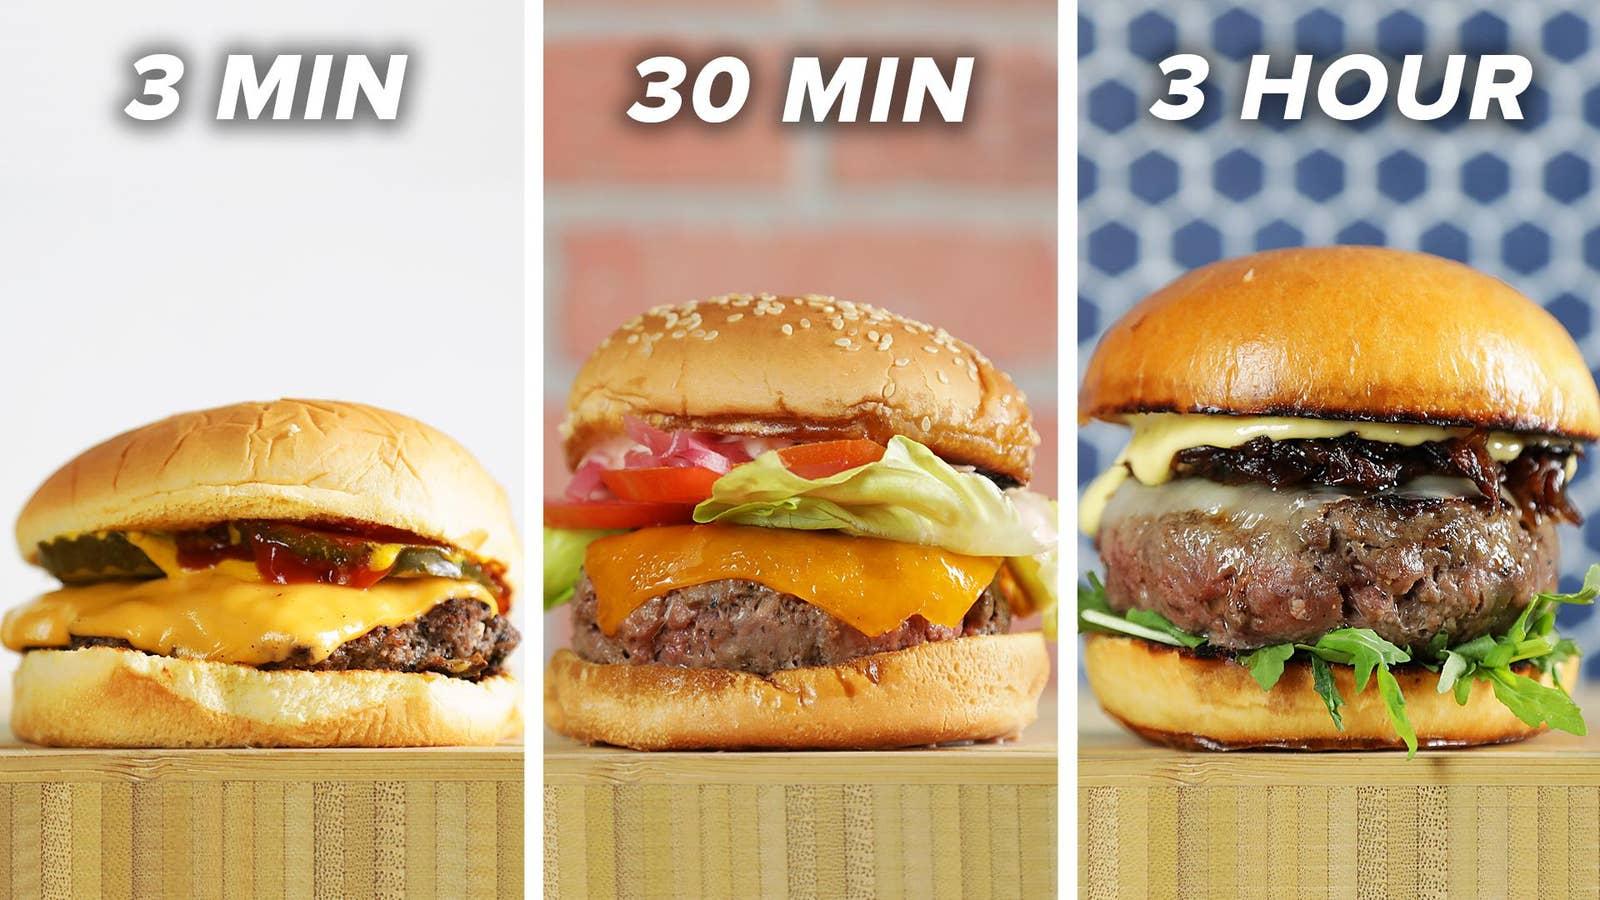 30-Minute Burger